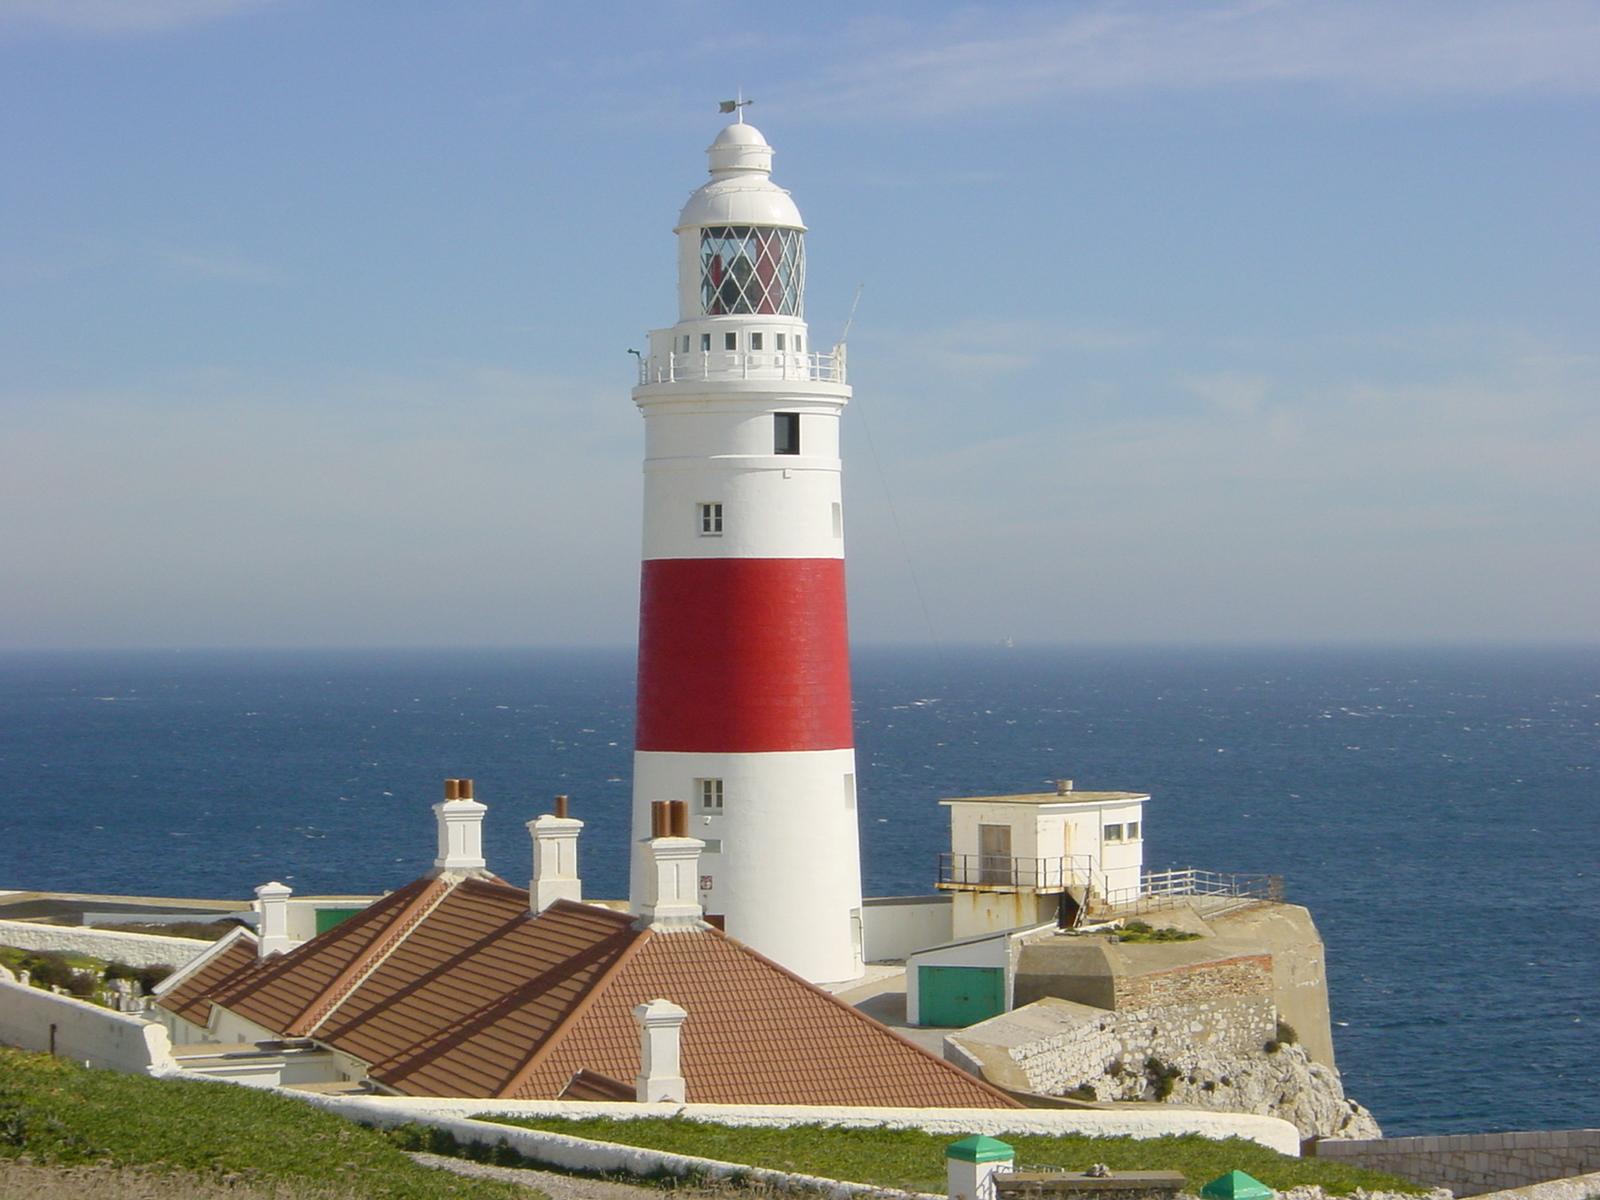 Europa Point Lighthouse - Wikipedia